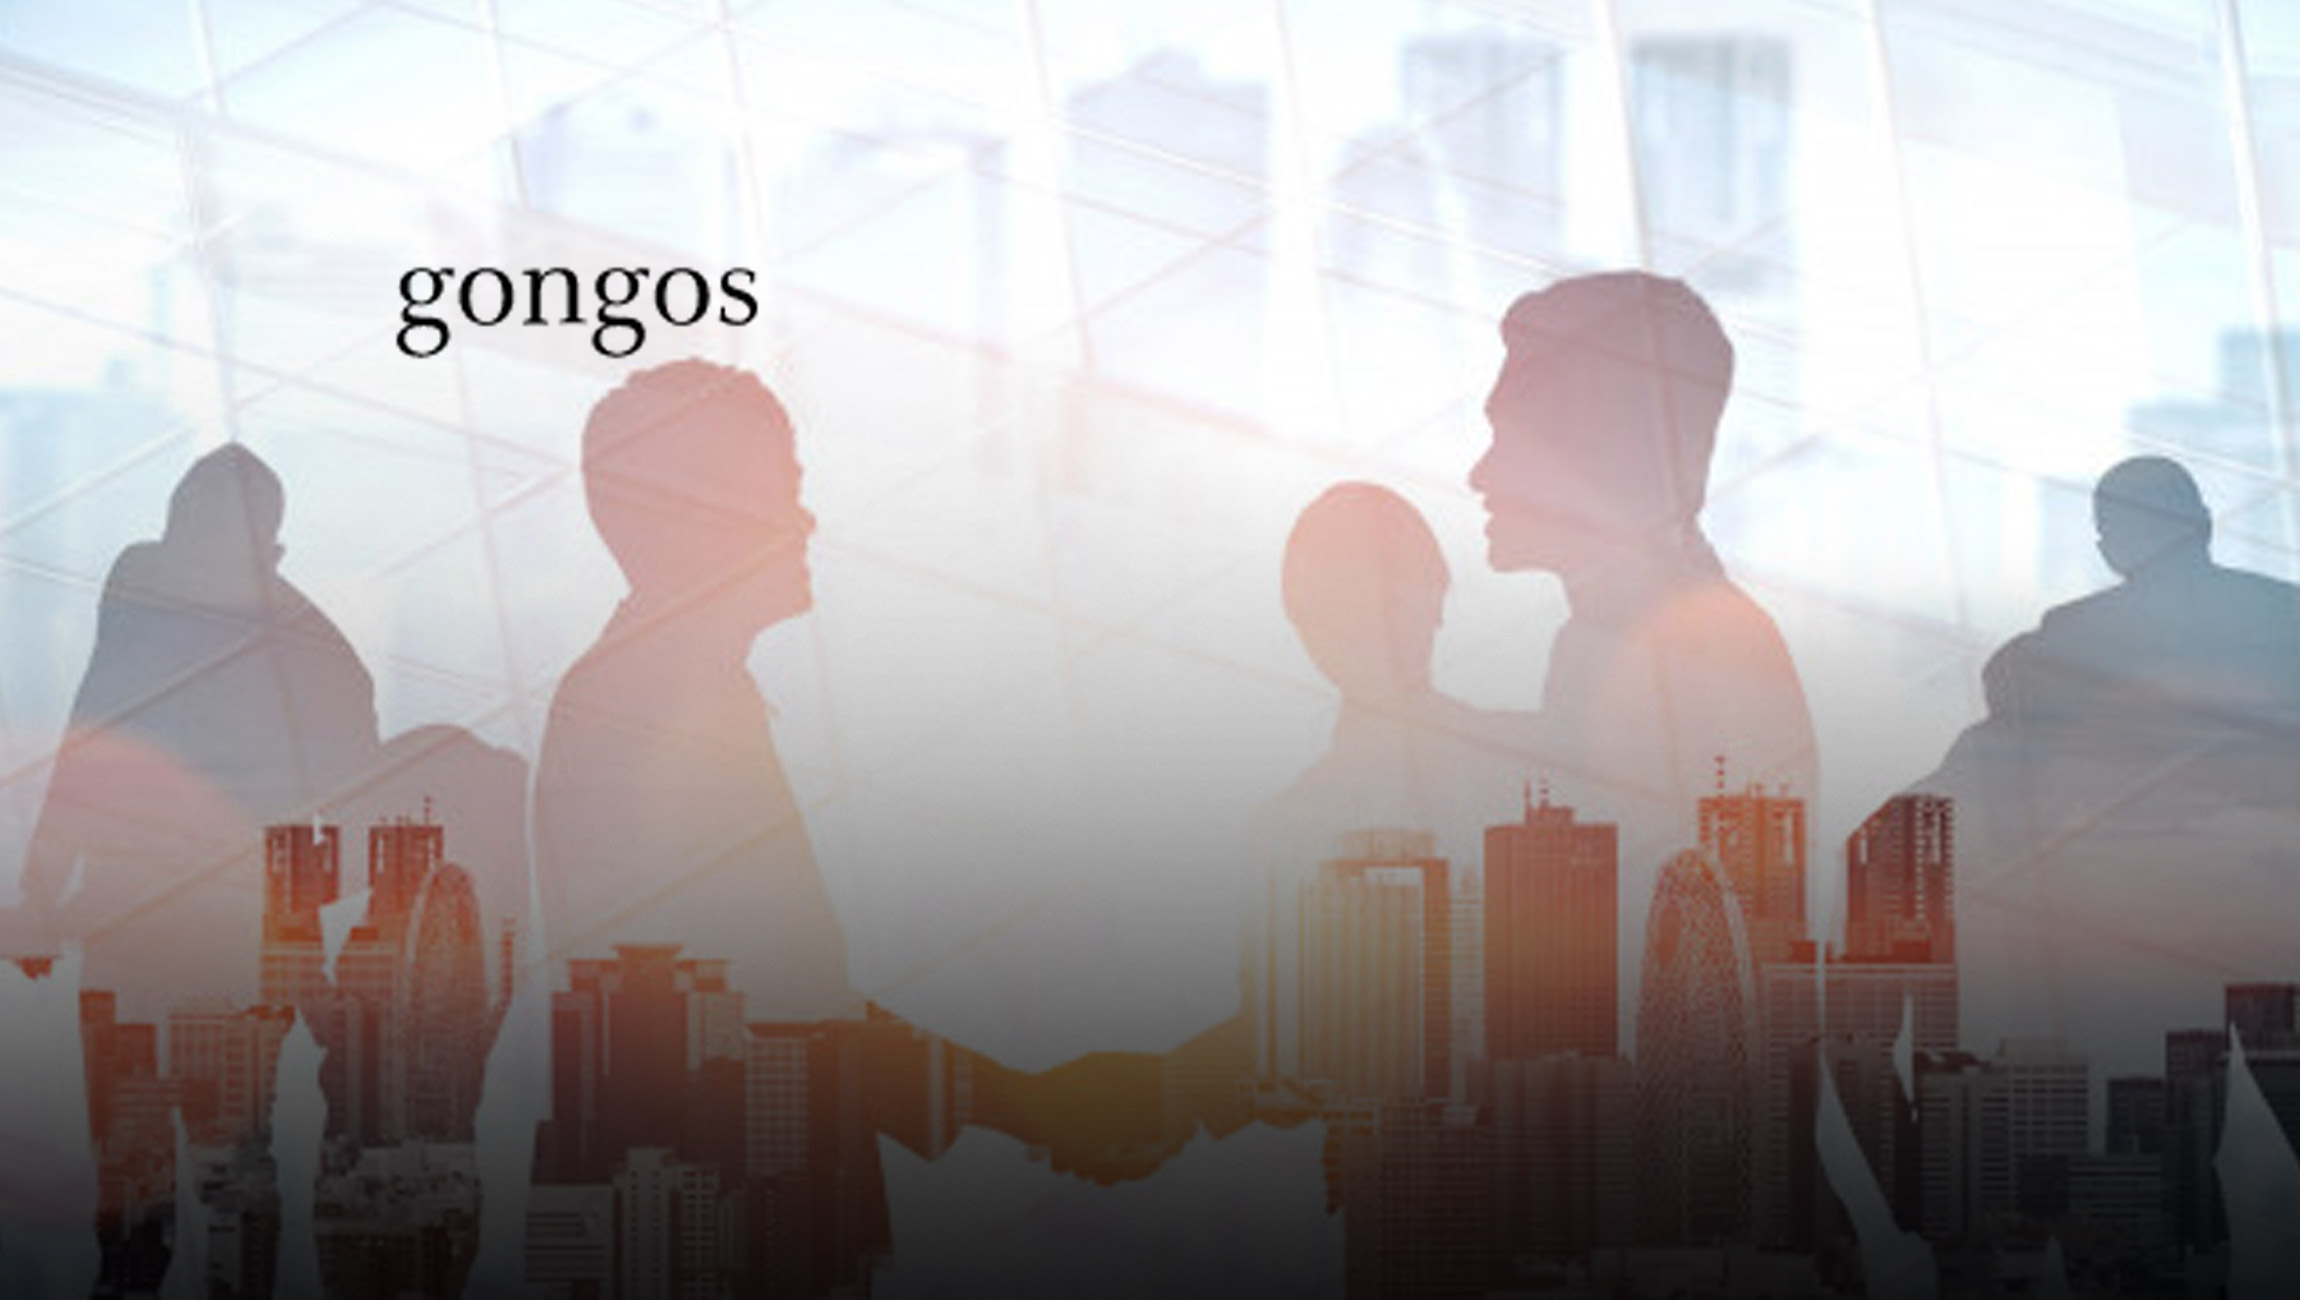 Gongos & DISQO Partner to Transform Digital Behavioral Insights